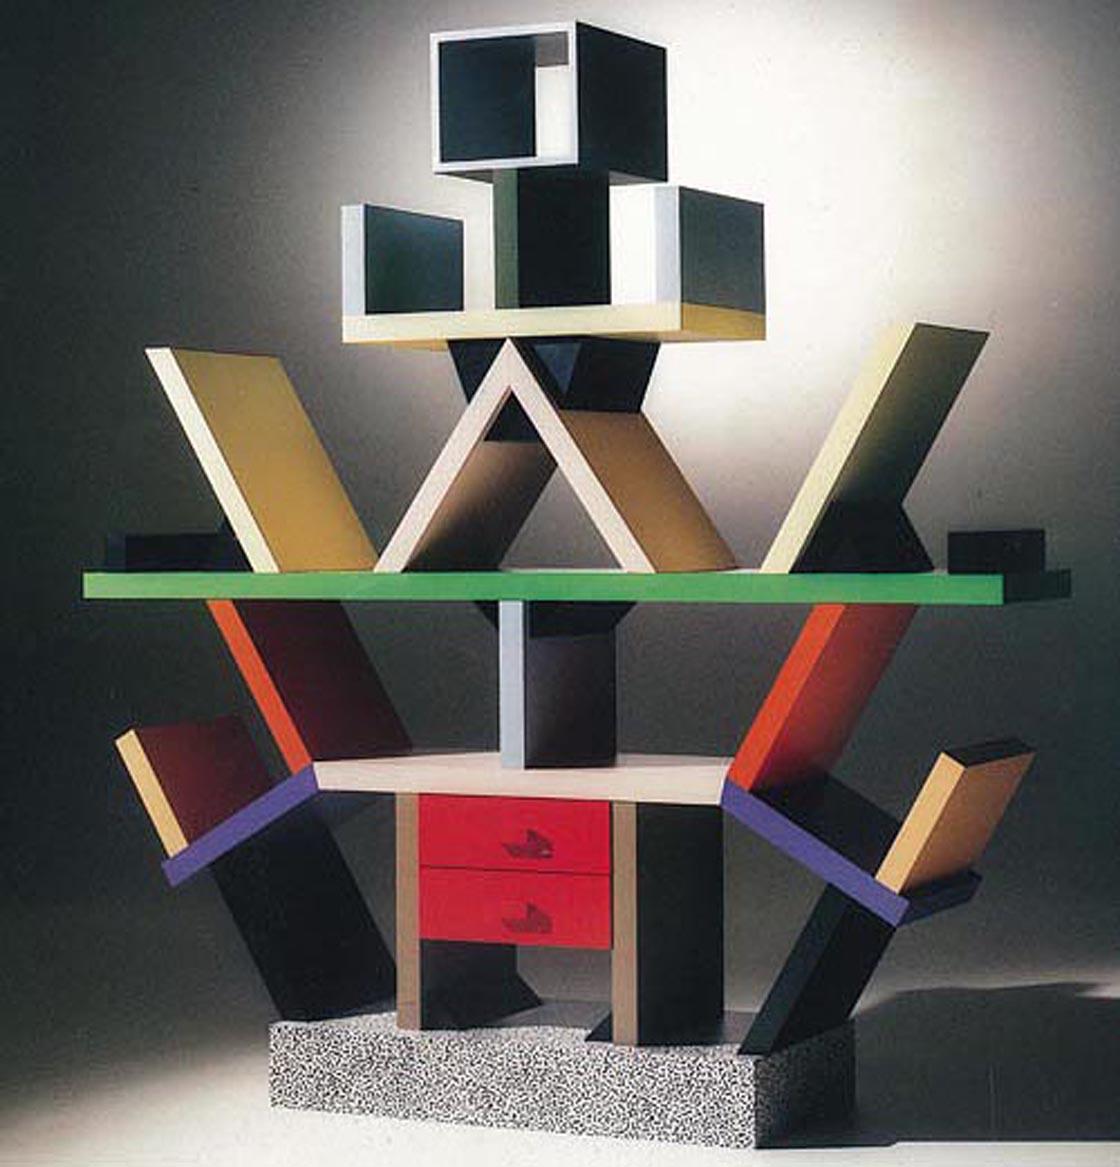 Ettore Sottsass, Libreria Carlton (1981)